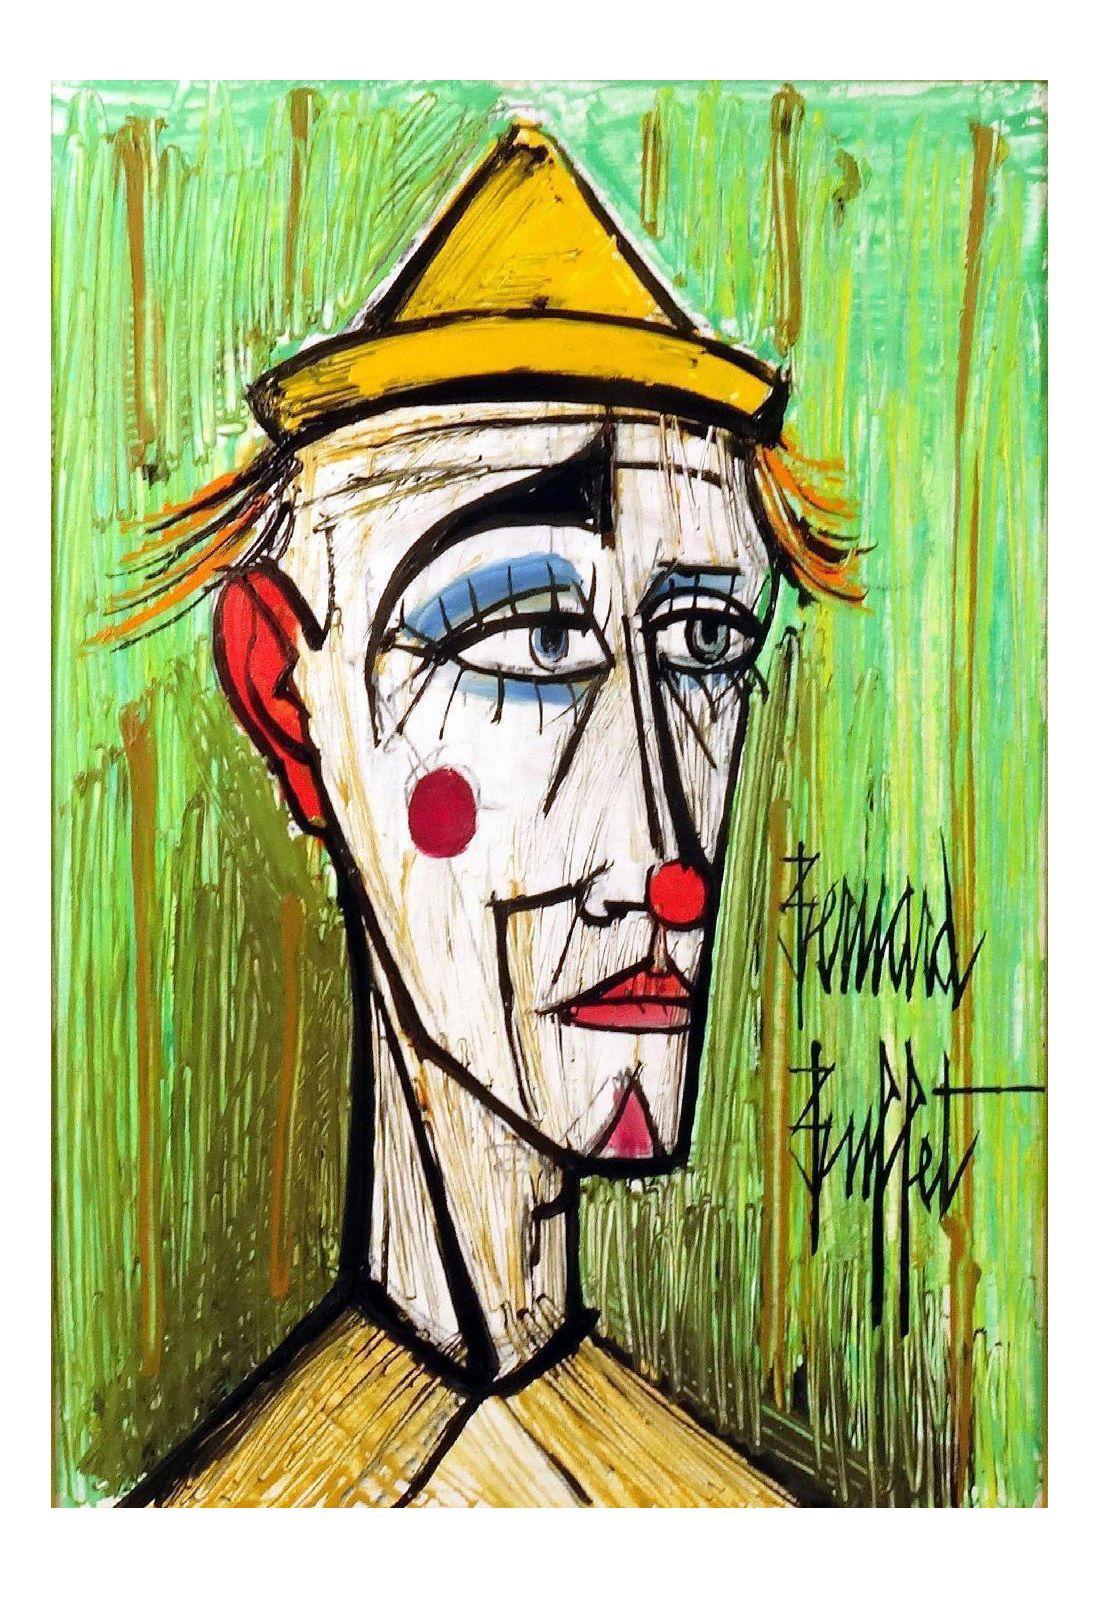 Les clowns de Bernard Buffet 679a64f750652e7a56779dc6e3e96478